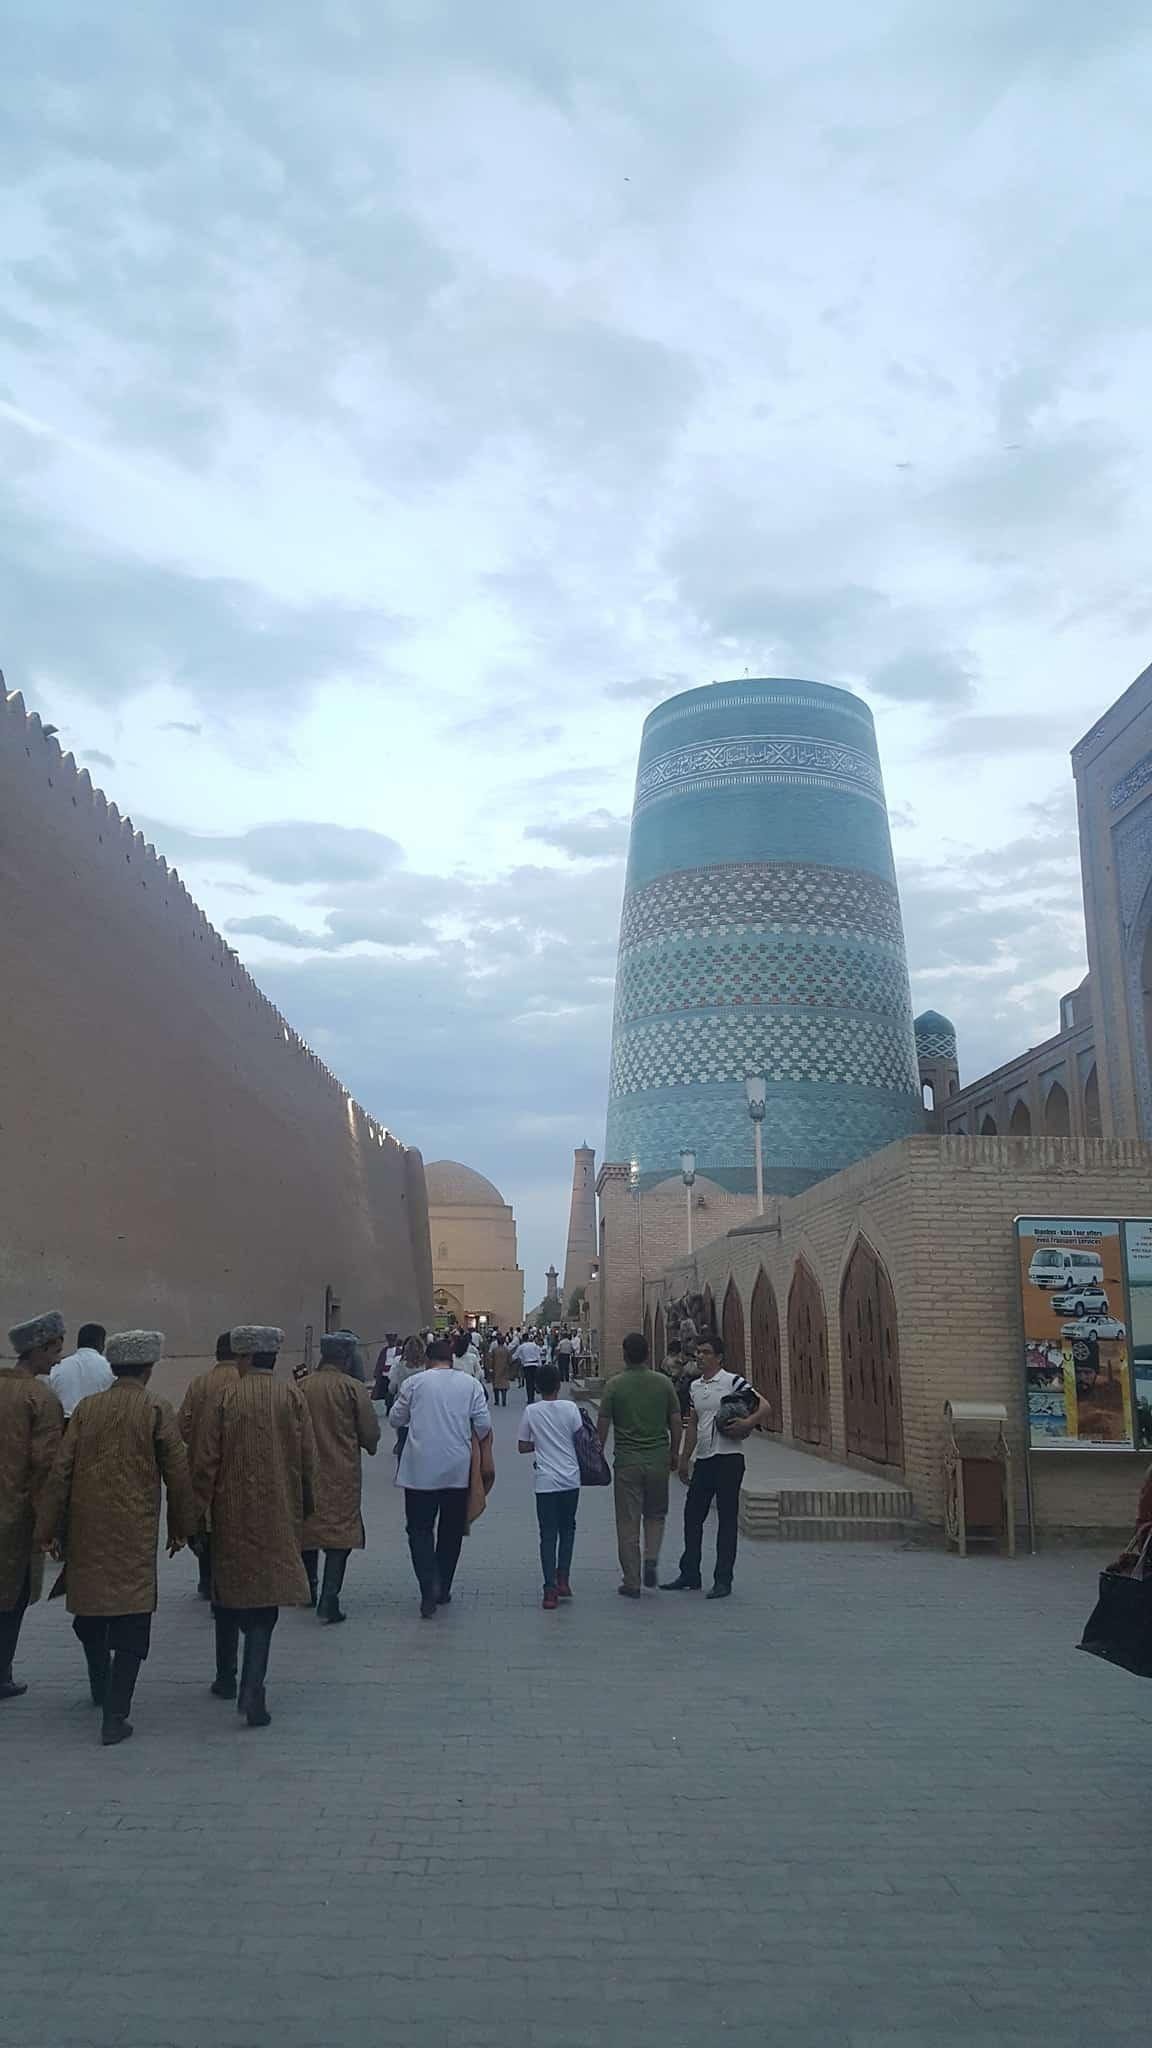 Uzbekistan itinerary: Itchan Kala, Khiva